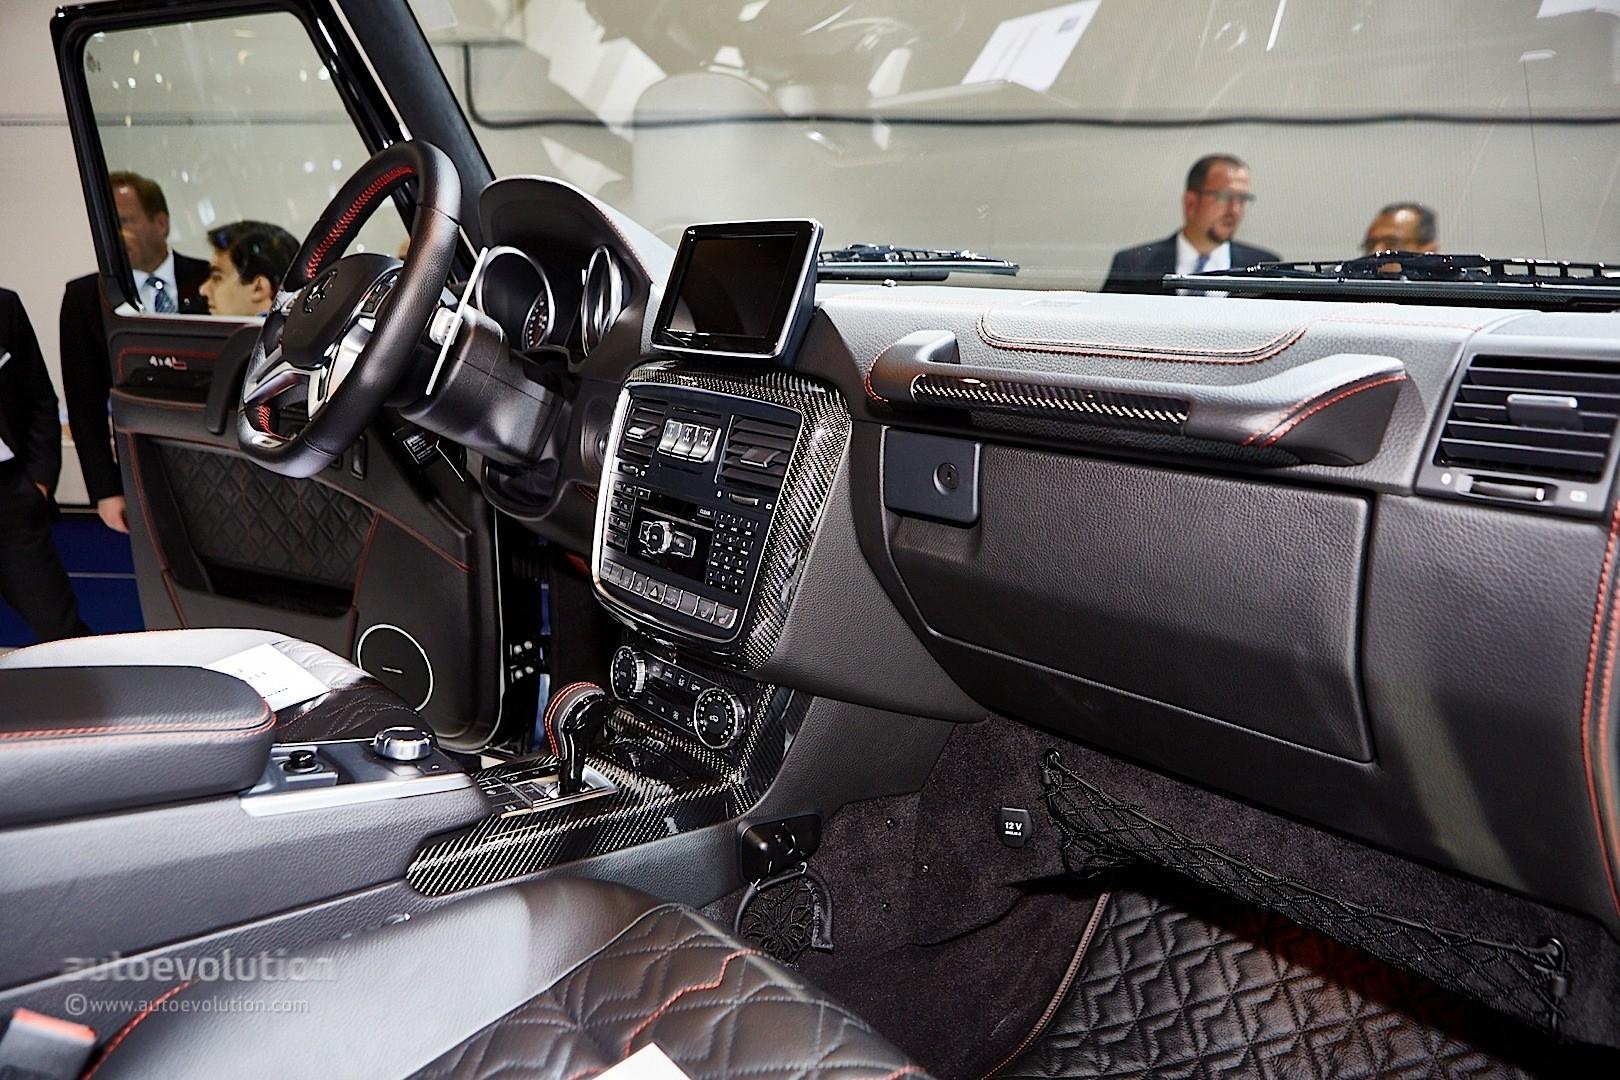 Brabus Mercedes G500 4x4 And G Class 850 Biturbo Widestar